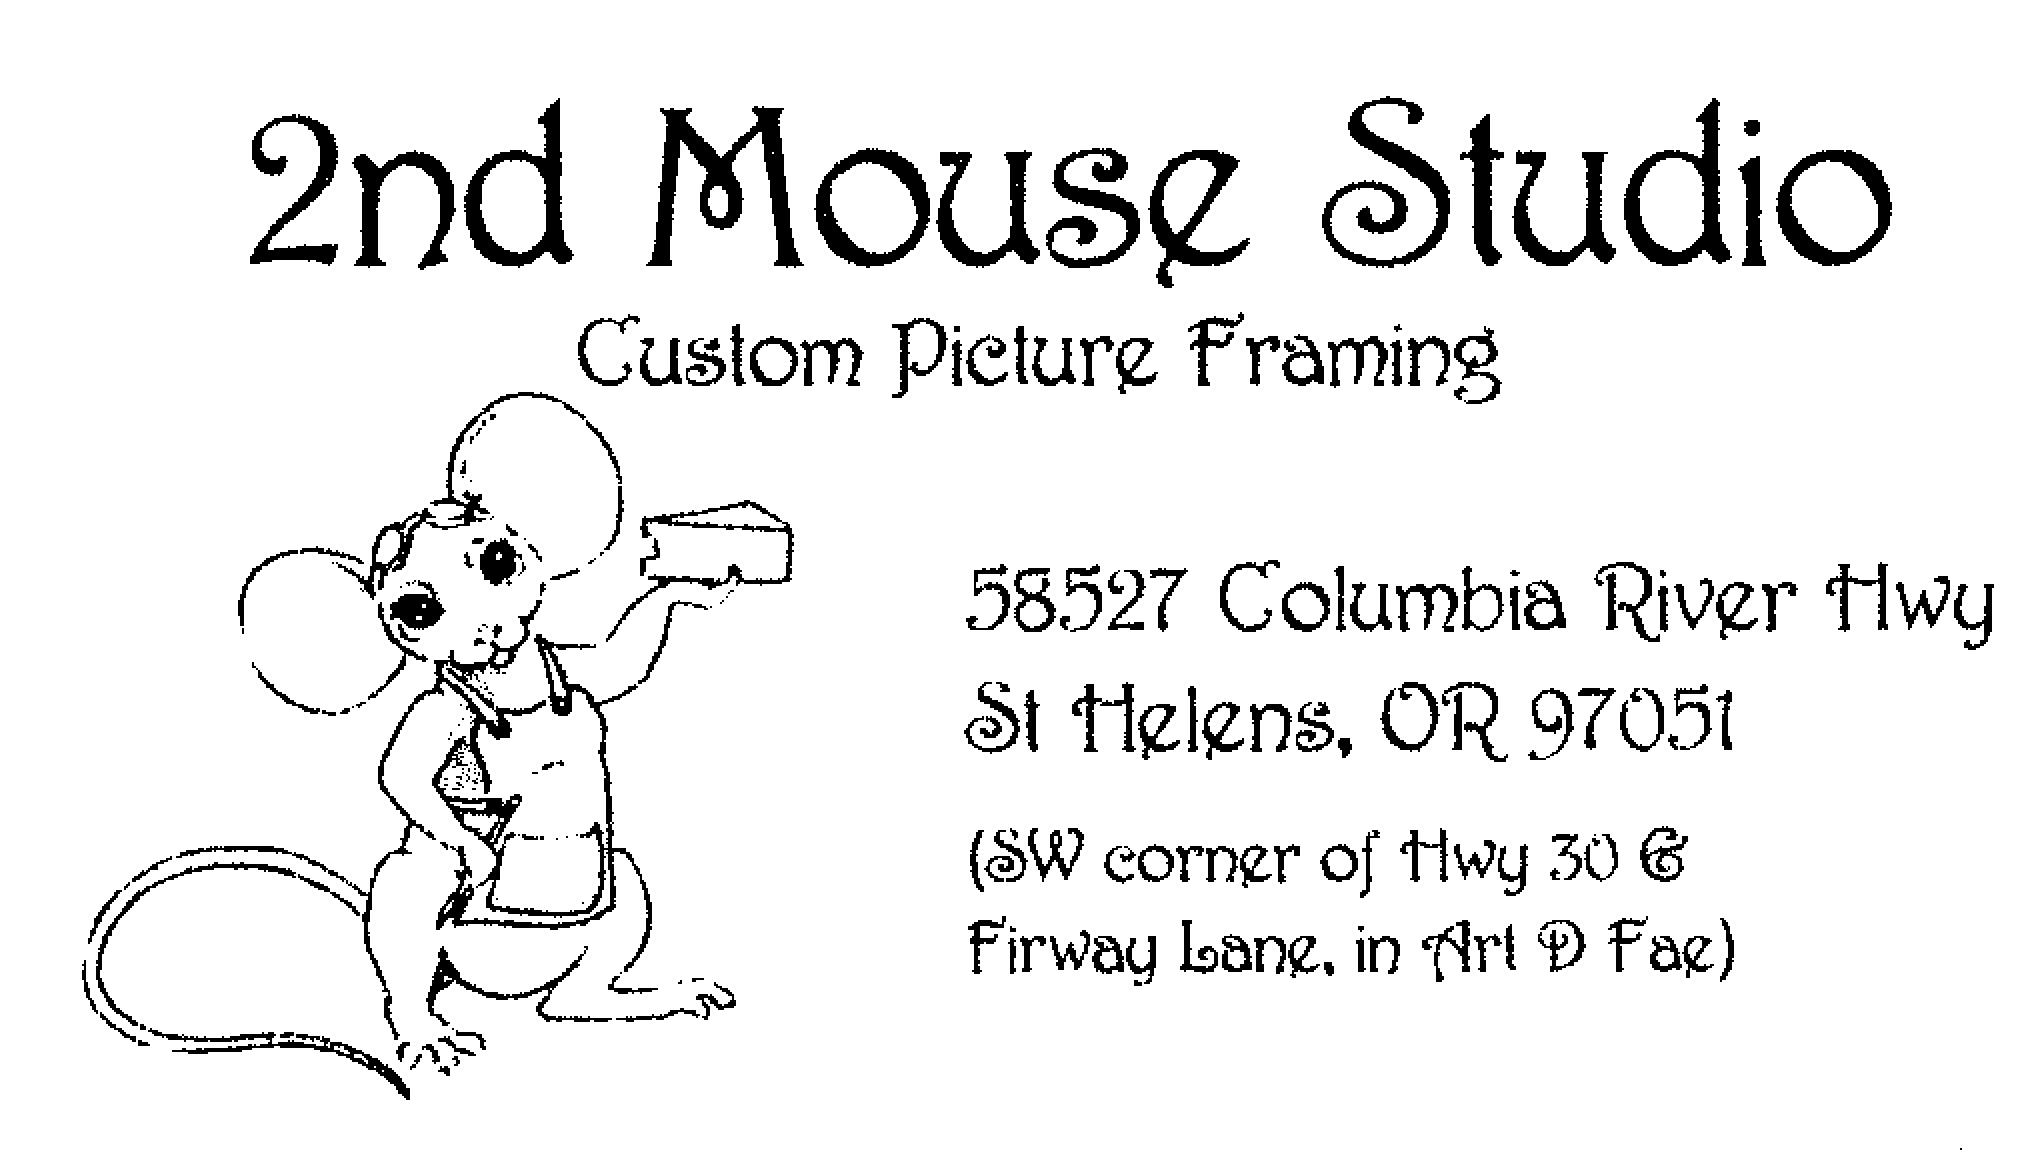 2nd mouse studio logo